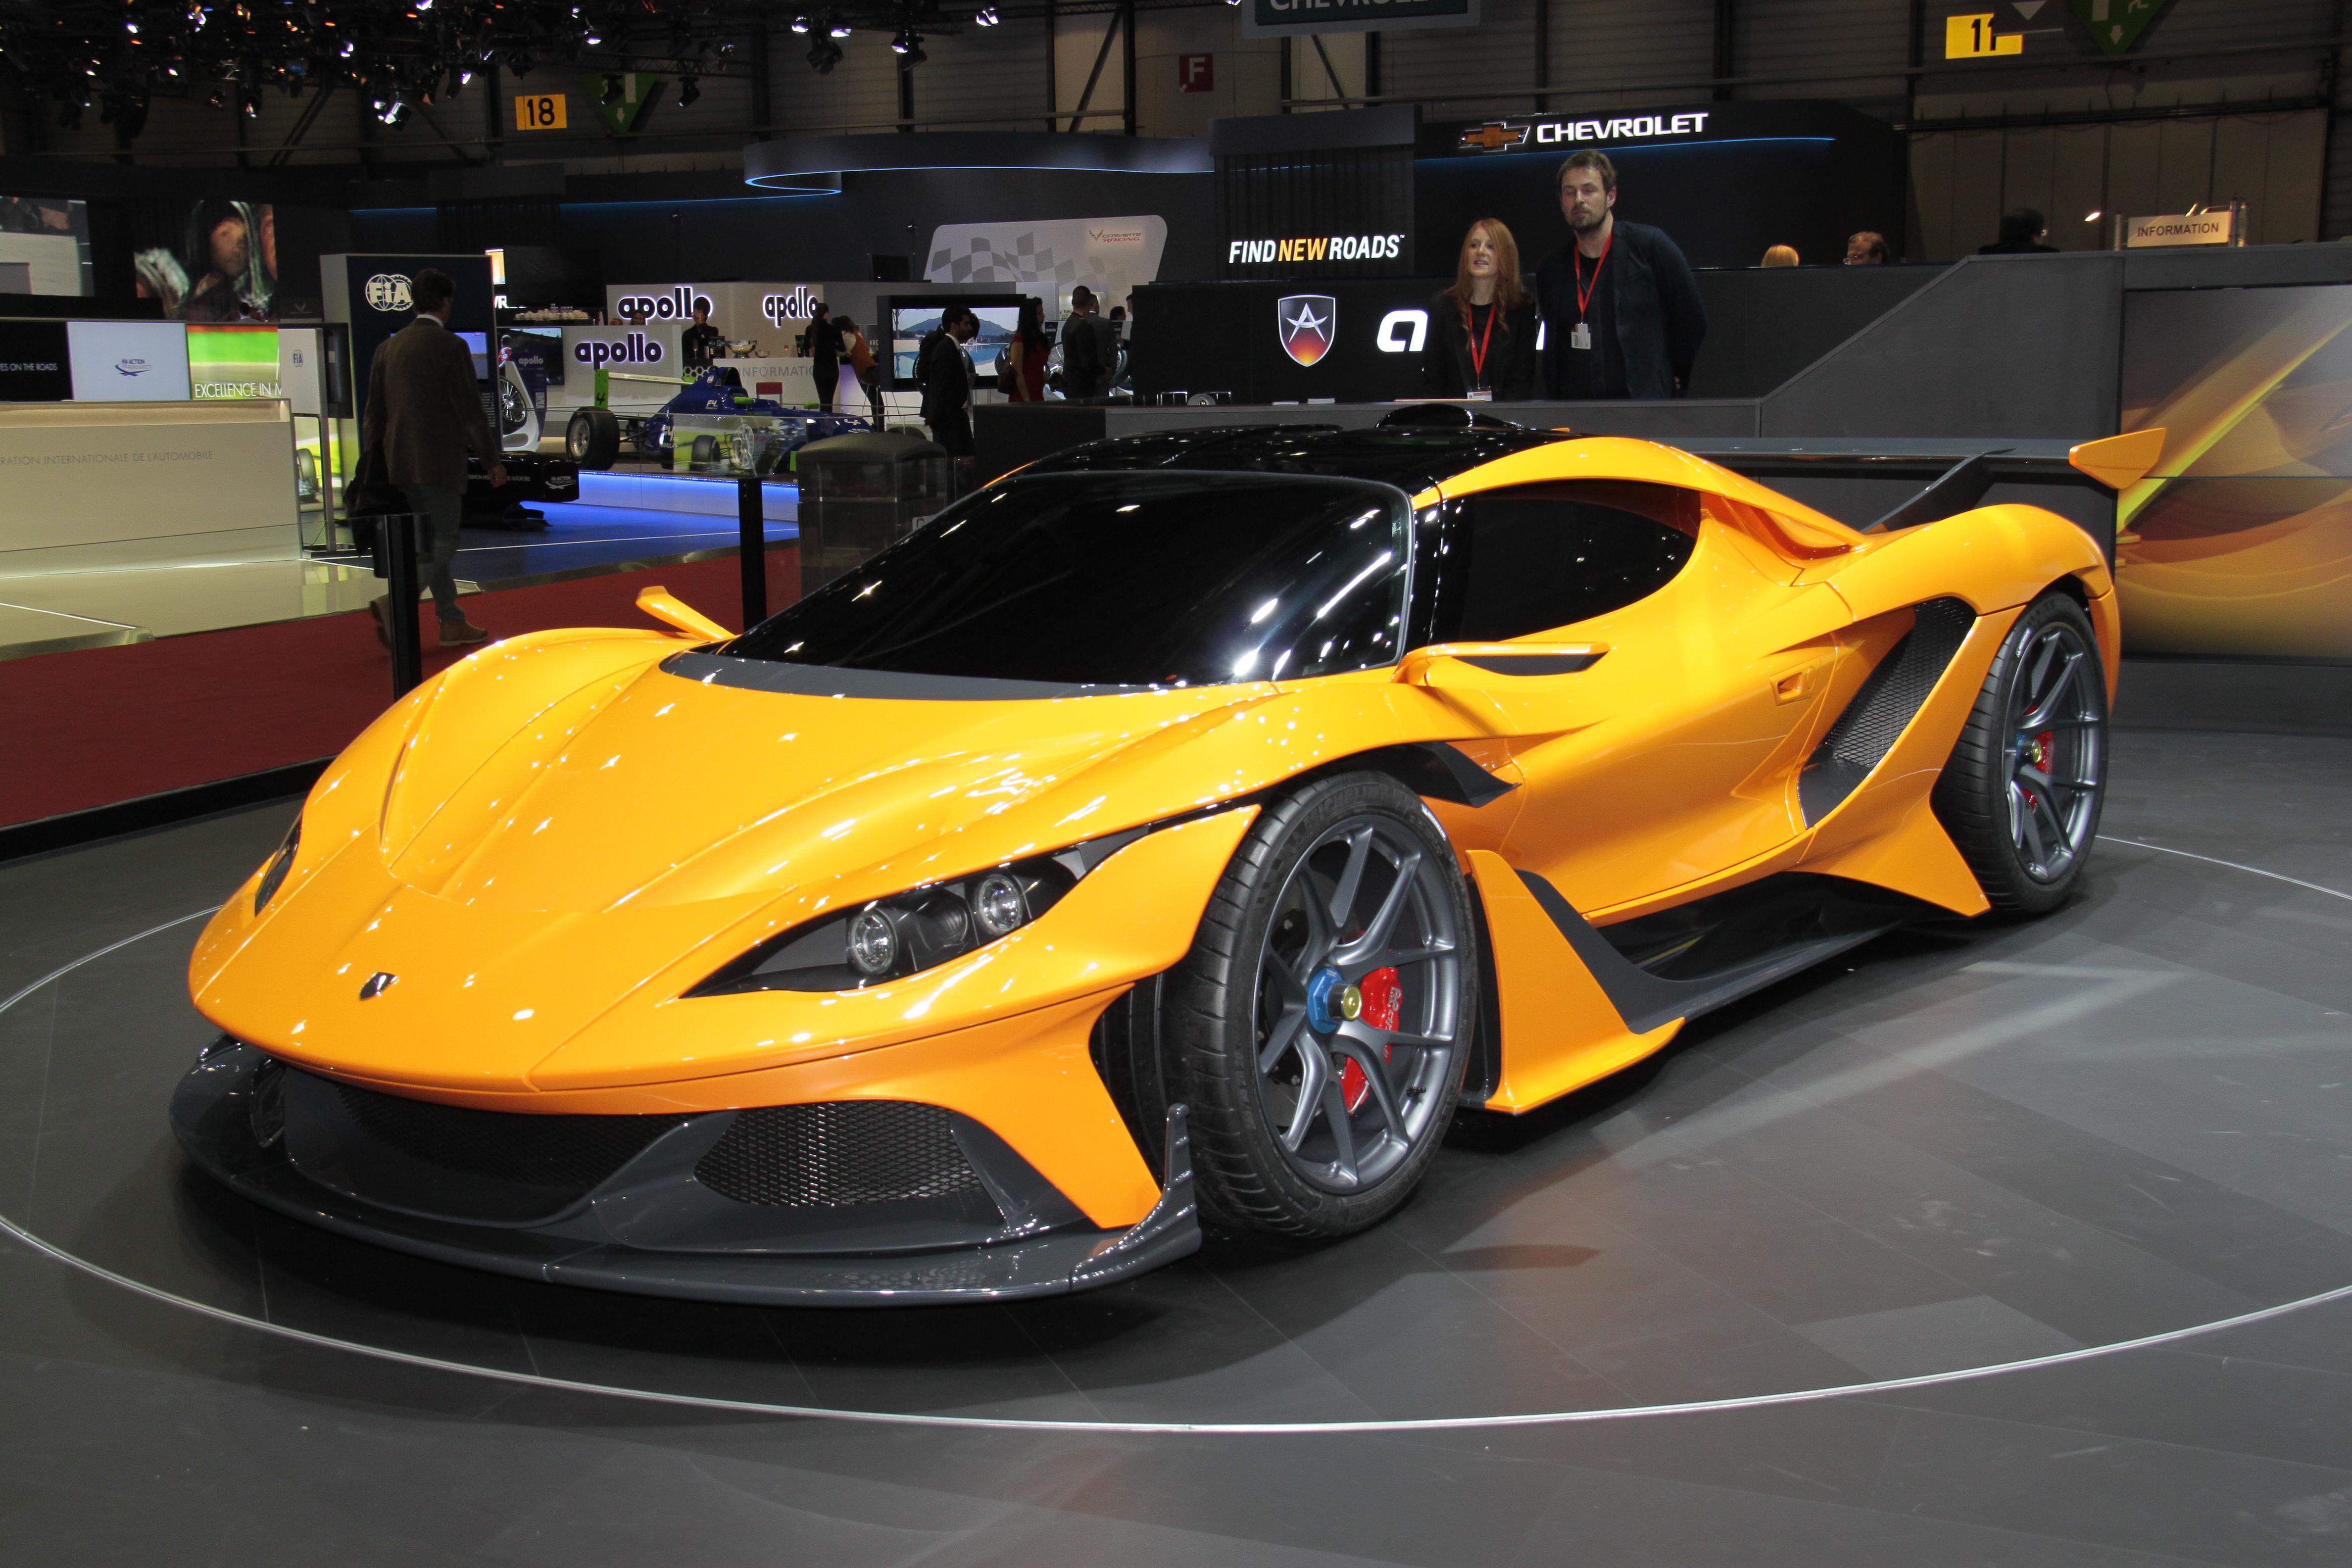 Build Your Own Car >> File:Apollo Arrow (55).JPG - Wikimedia Commons